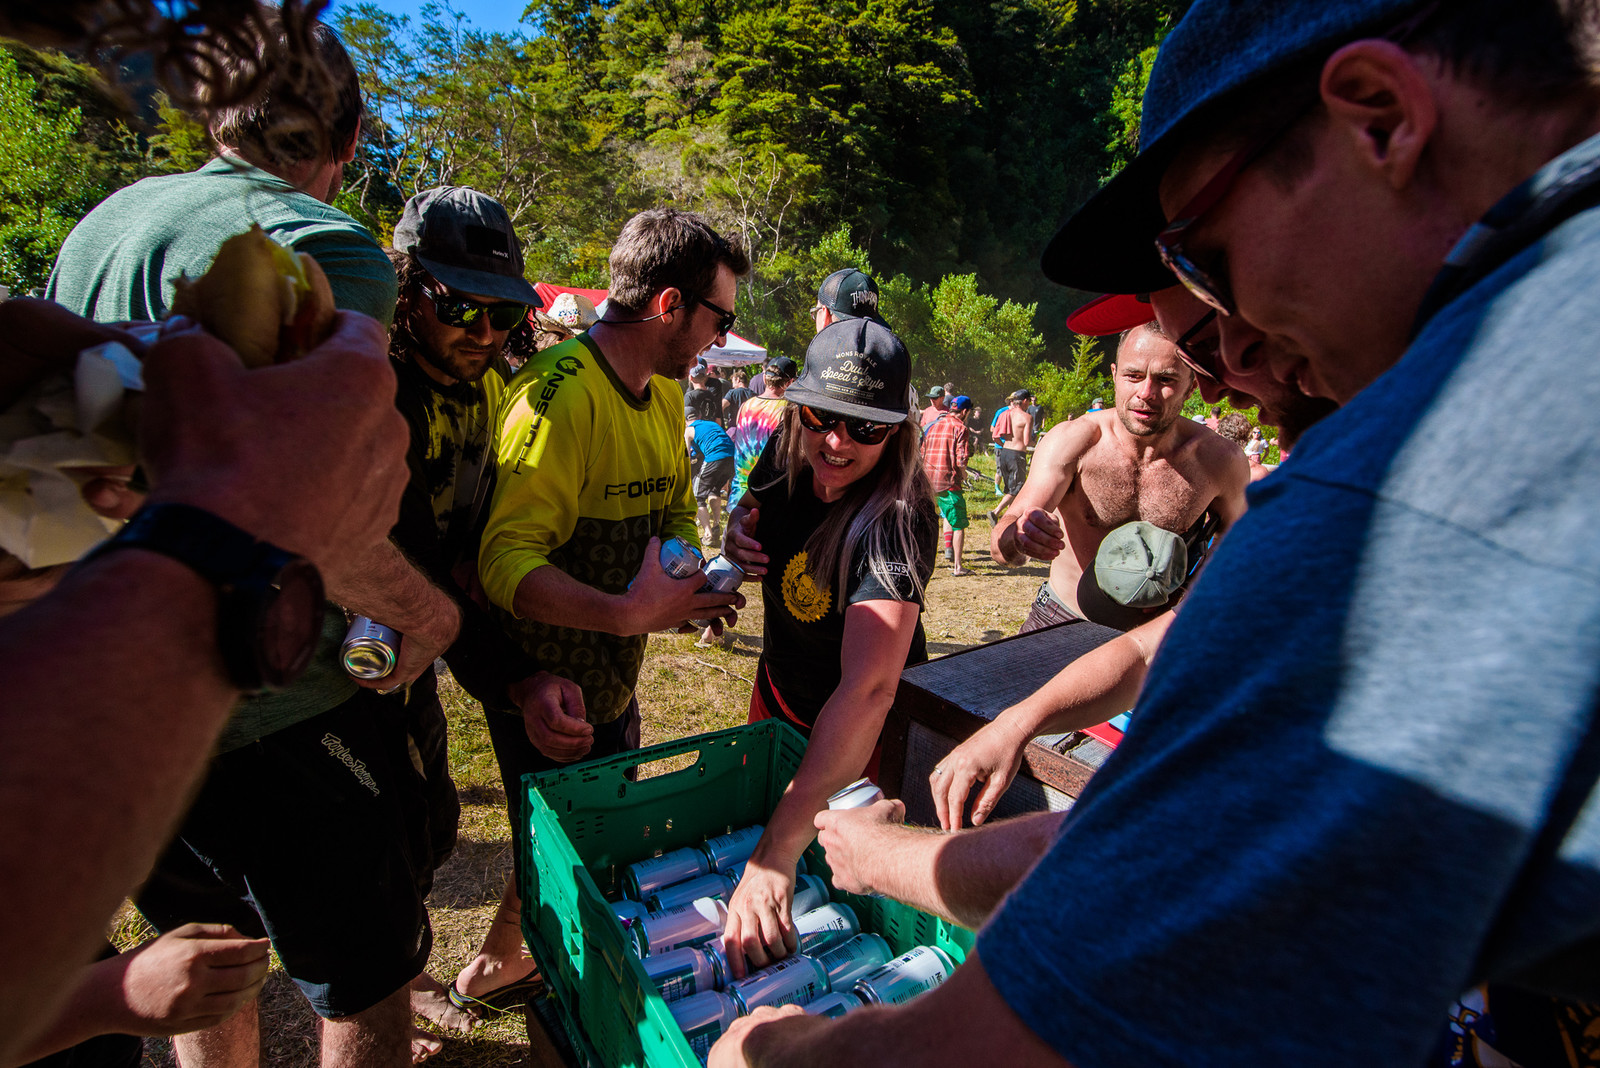 Free Beer - 2019 Dodzy Memorial Enduro - Mountain Biking Pictures - Vital MTB